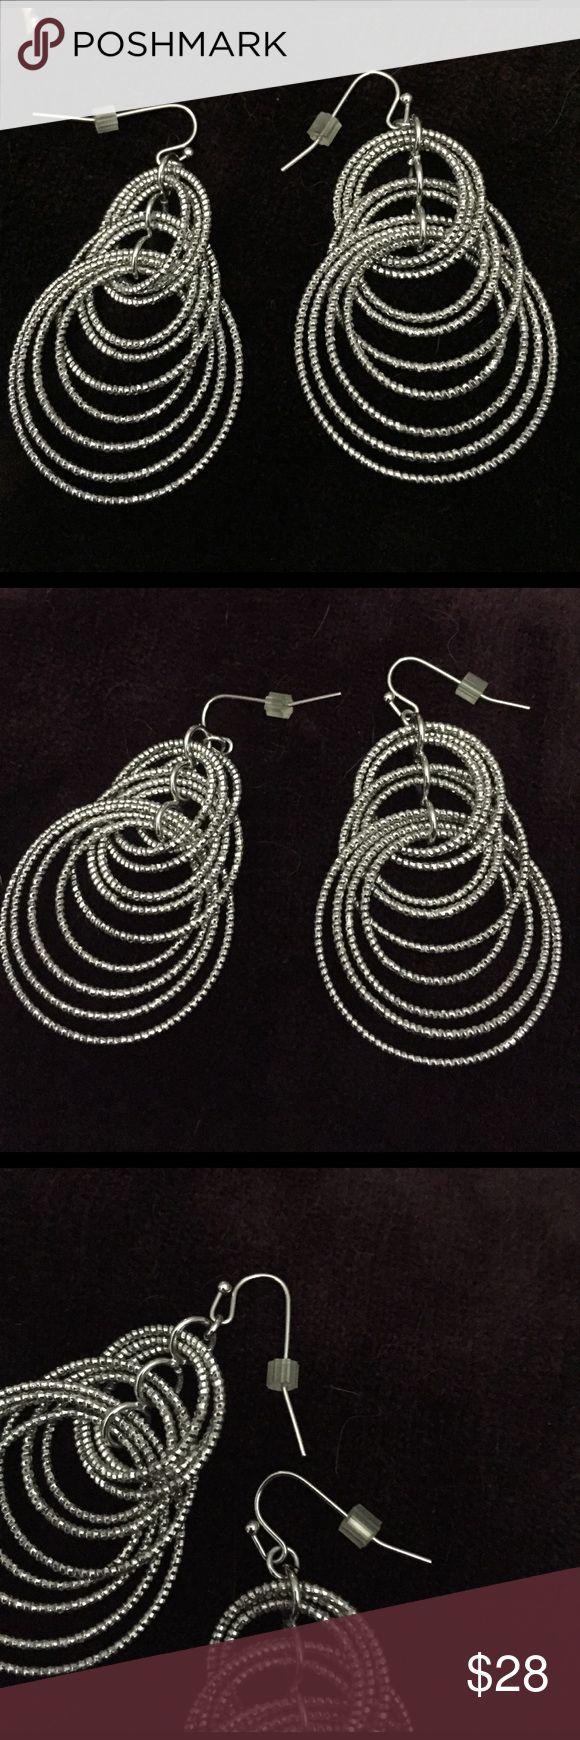 Lia Sophia silver dangling earrings Lia Sophia silver dangling earrings, very shiny and sparkly, 2.5 inches in length, each earring has 9 dangling engraved circles, NWOT no tarnishing Lia Sophia Jewelry Earrings